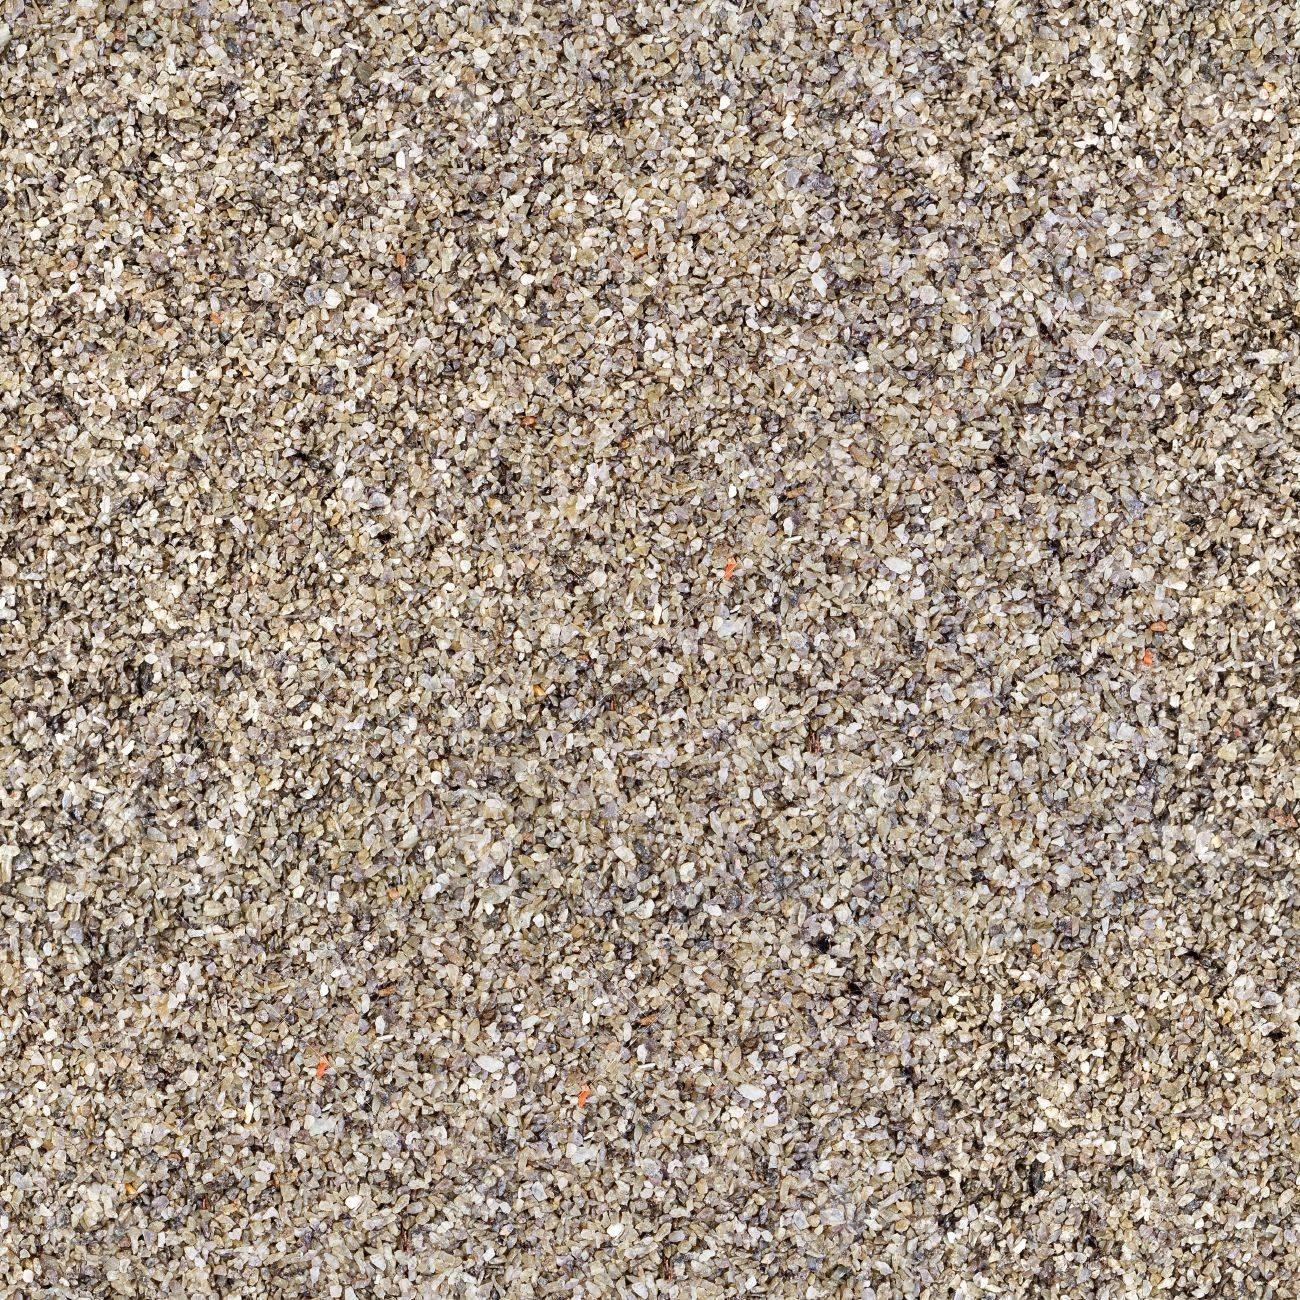 Gravel Texture From Quartz Sand Seamless Square Texture Tile